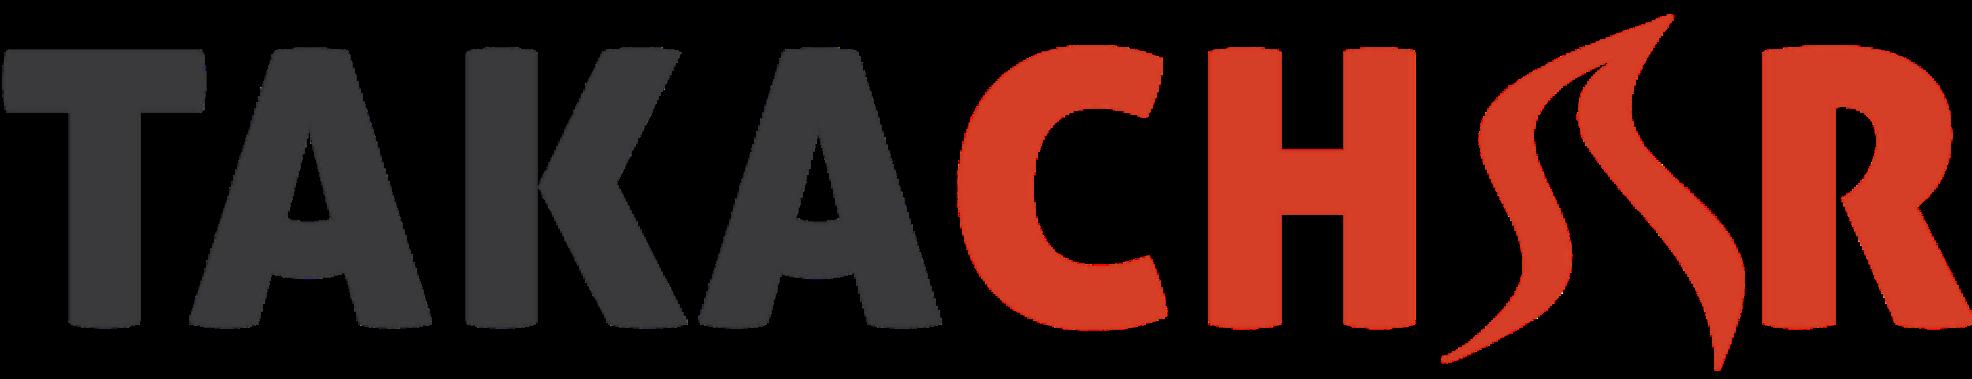 Takachar_logo.png